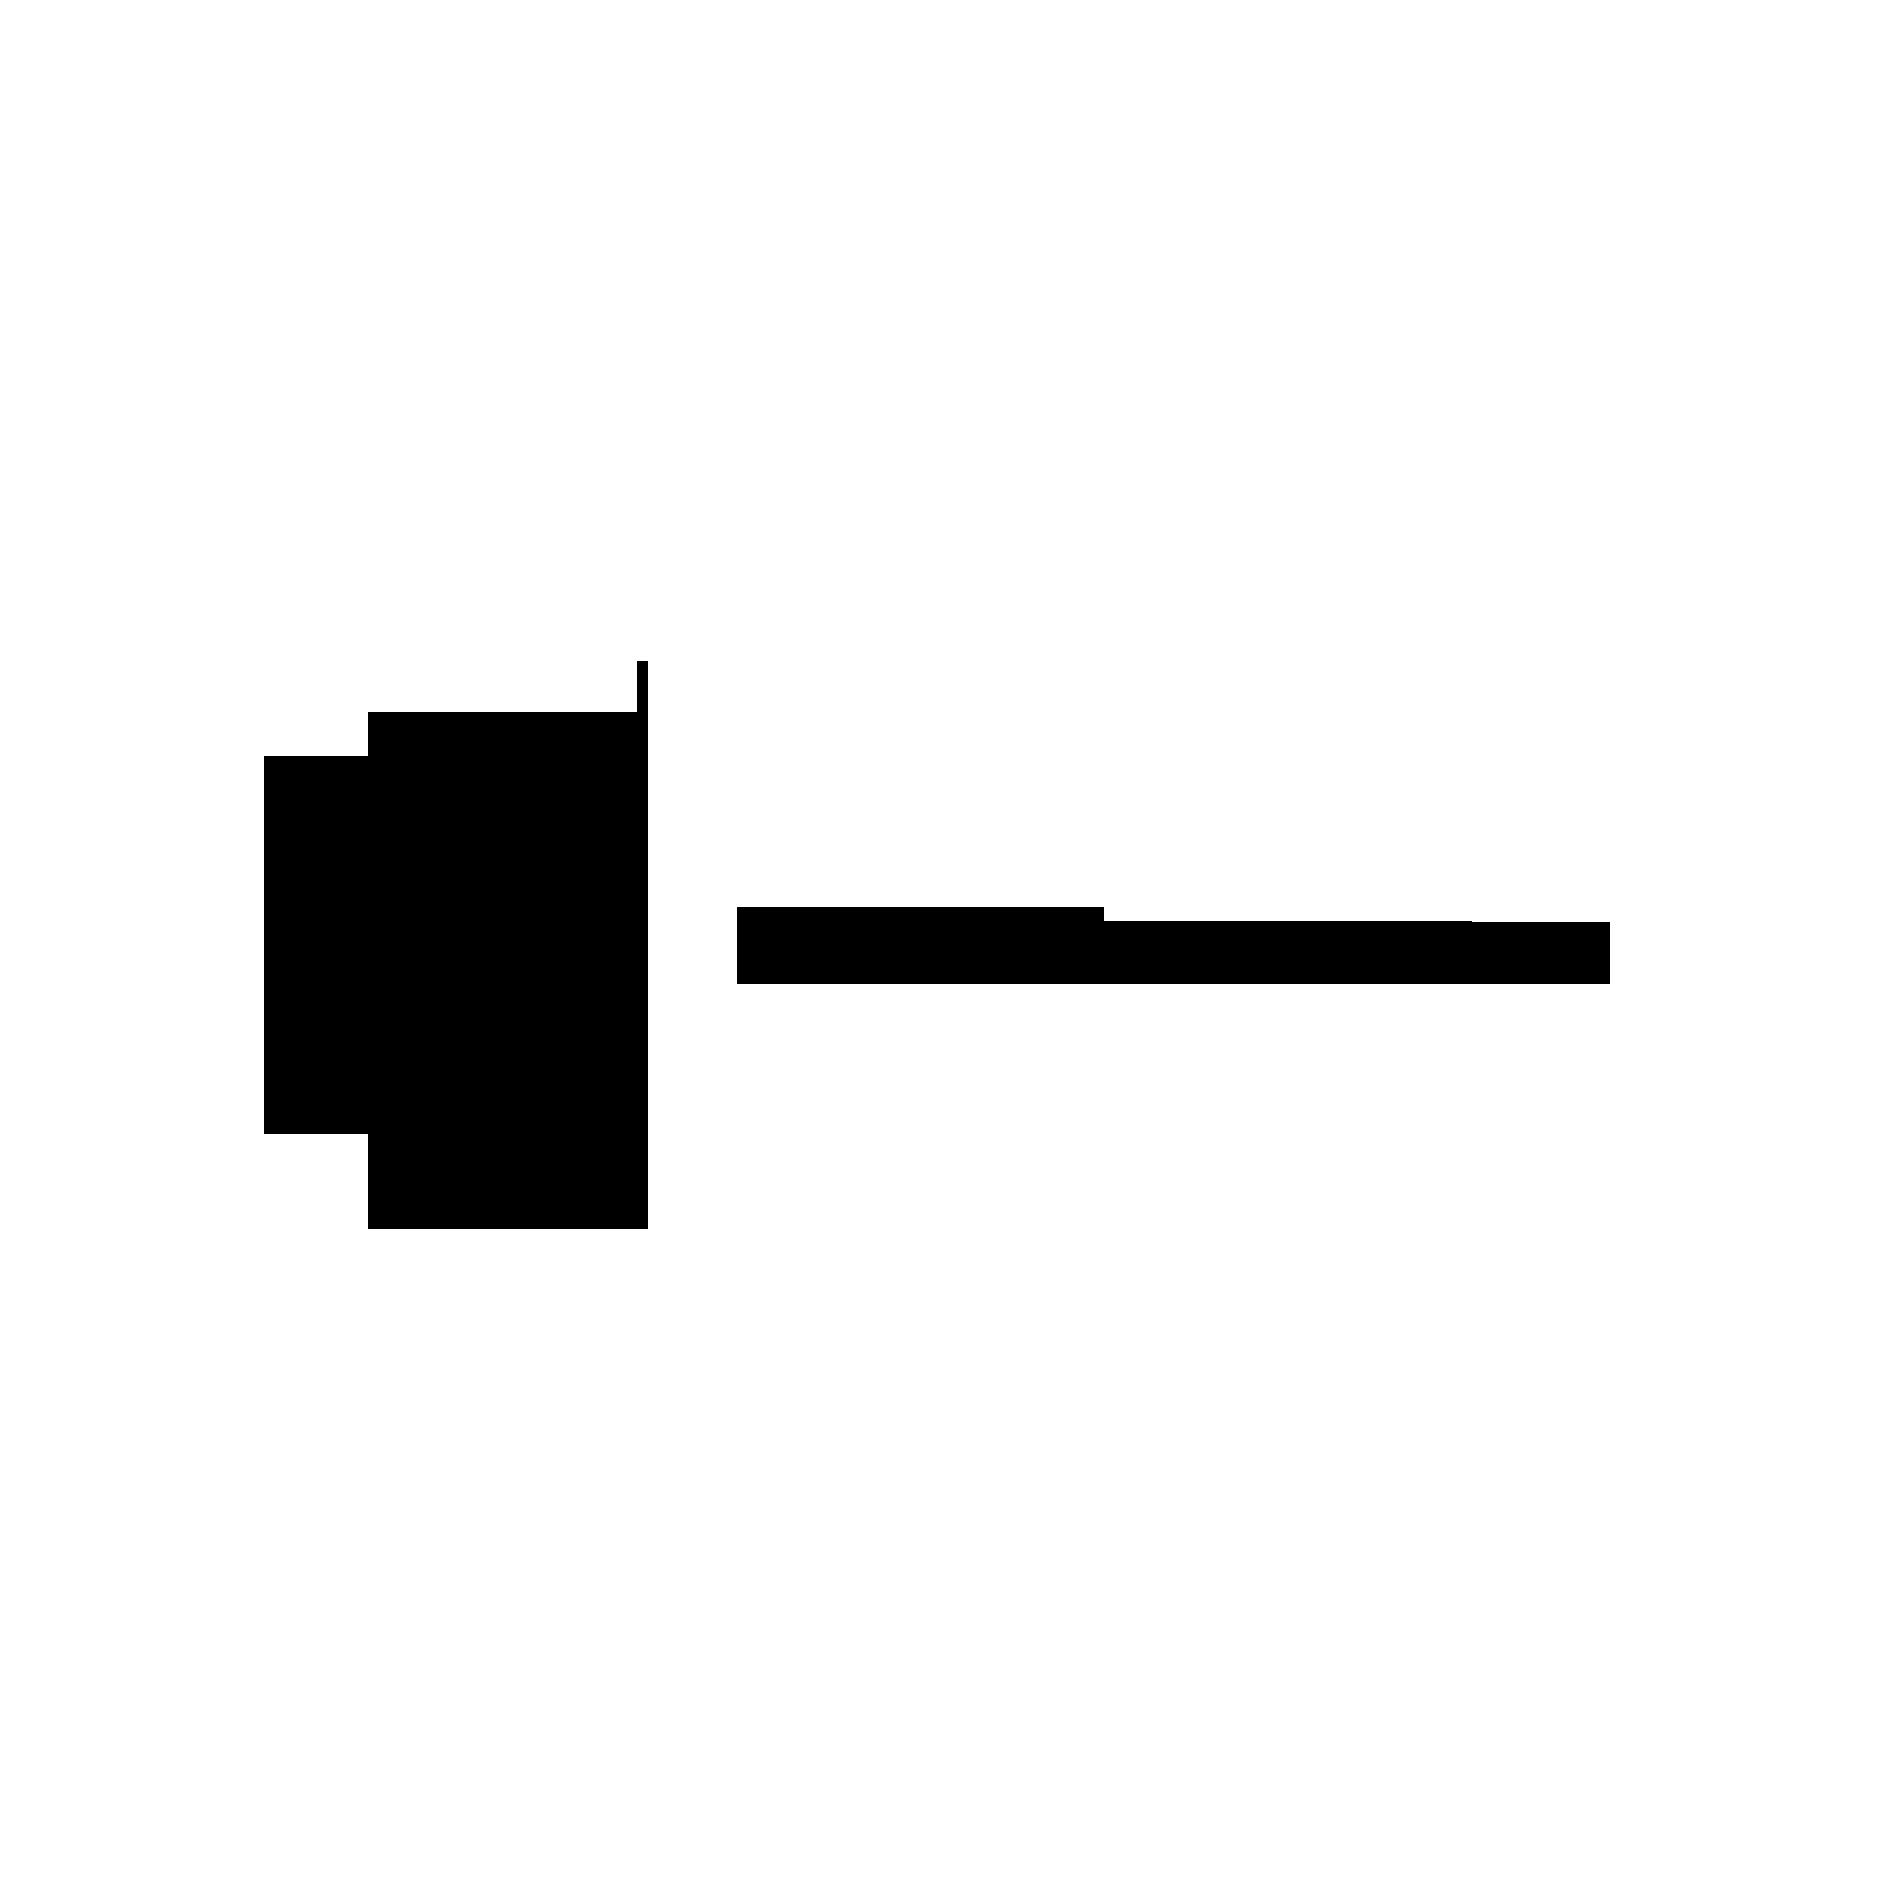 kaitsemin_3lovi_est_black